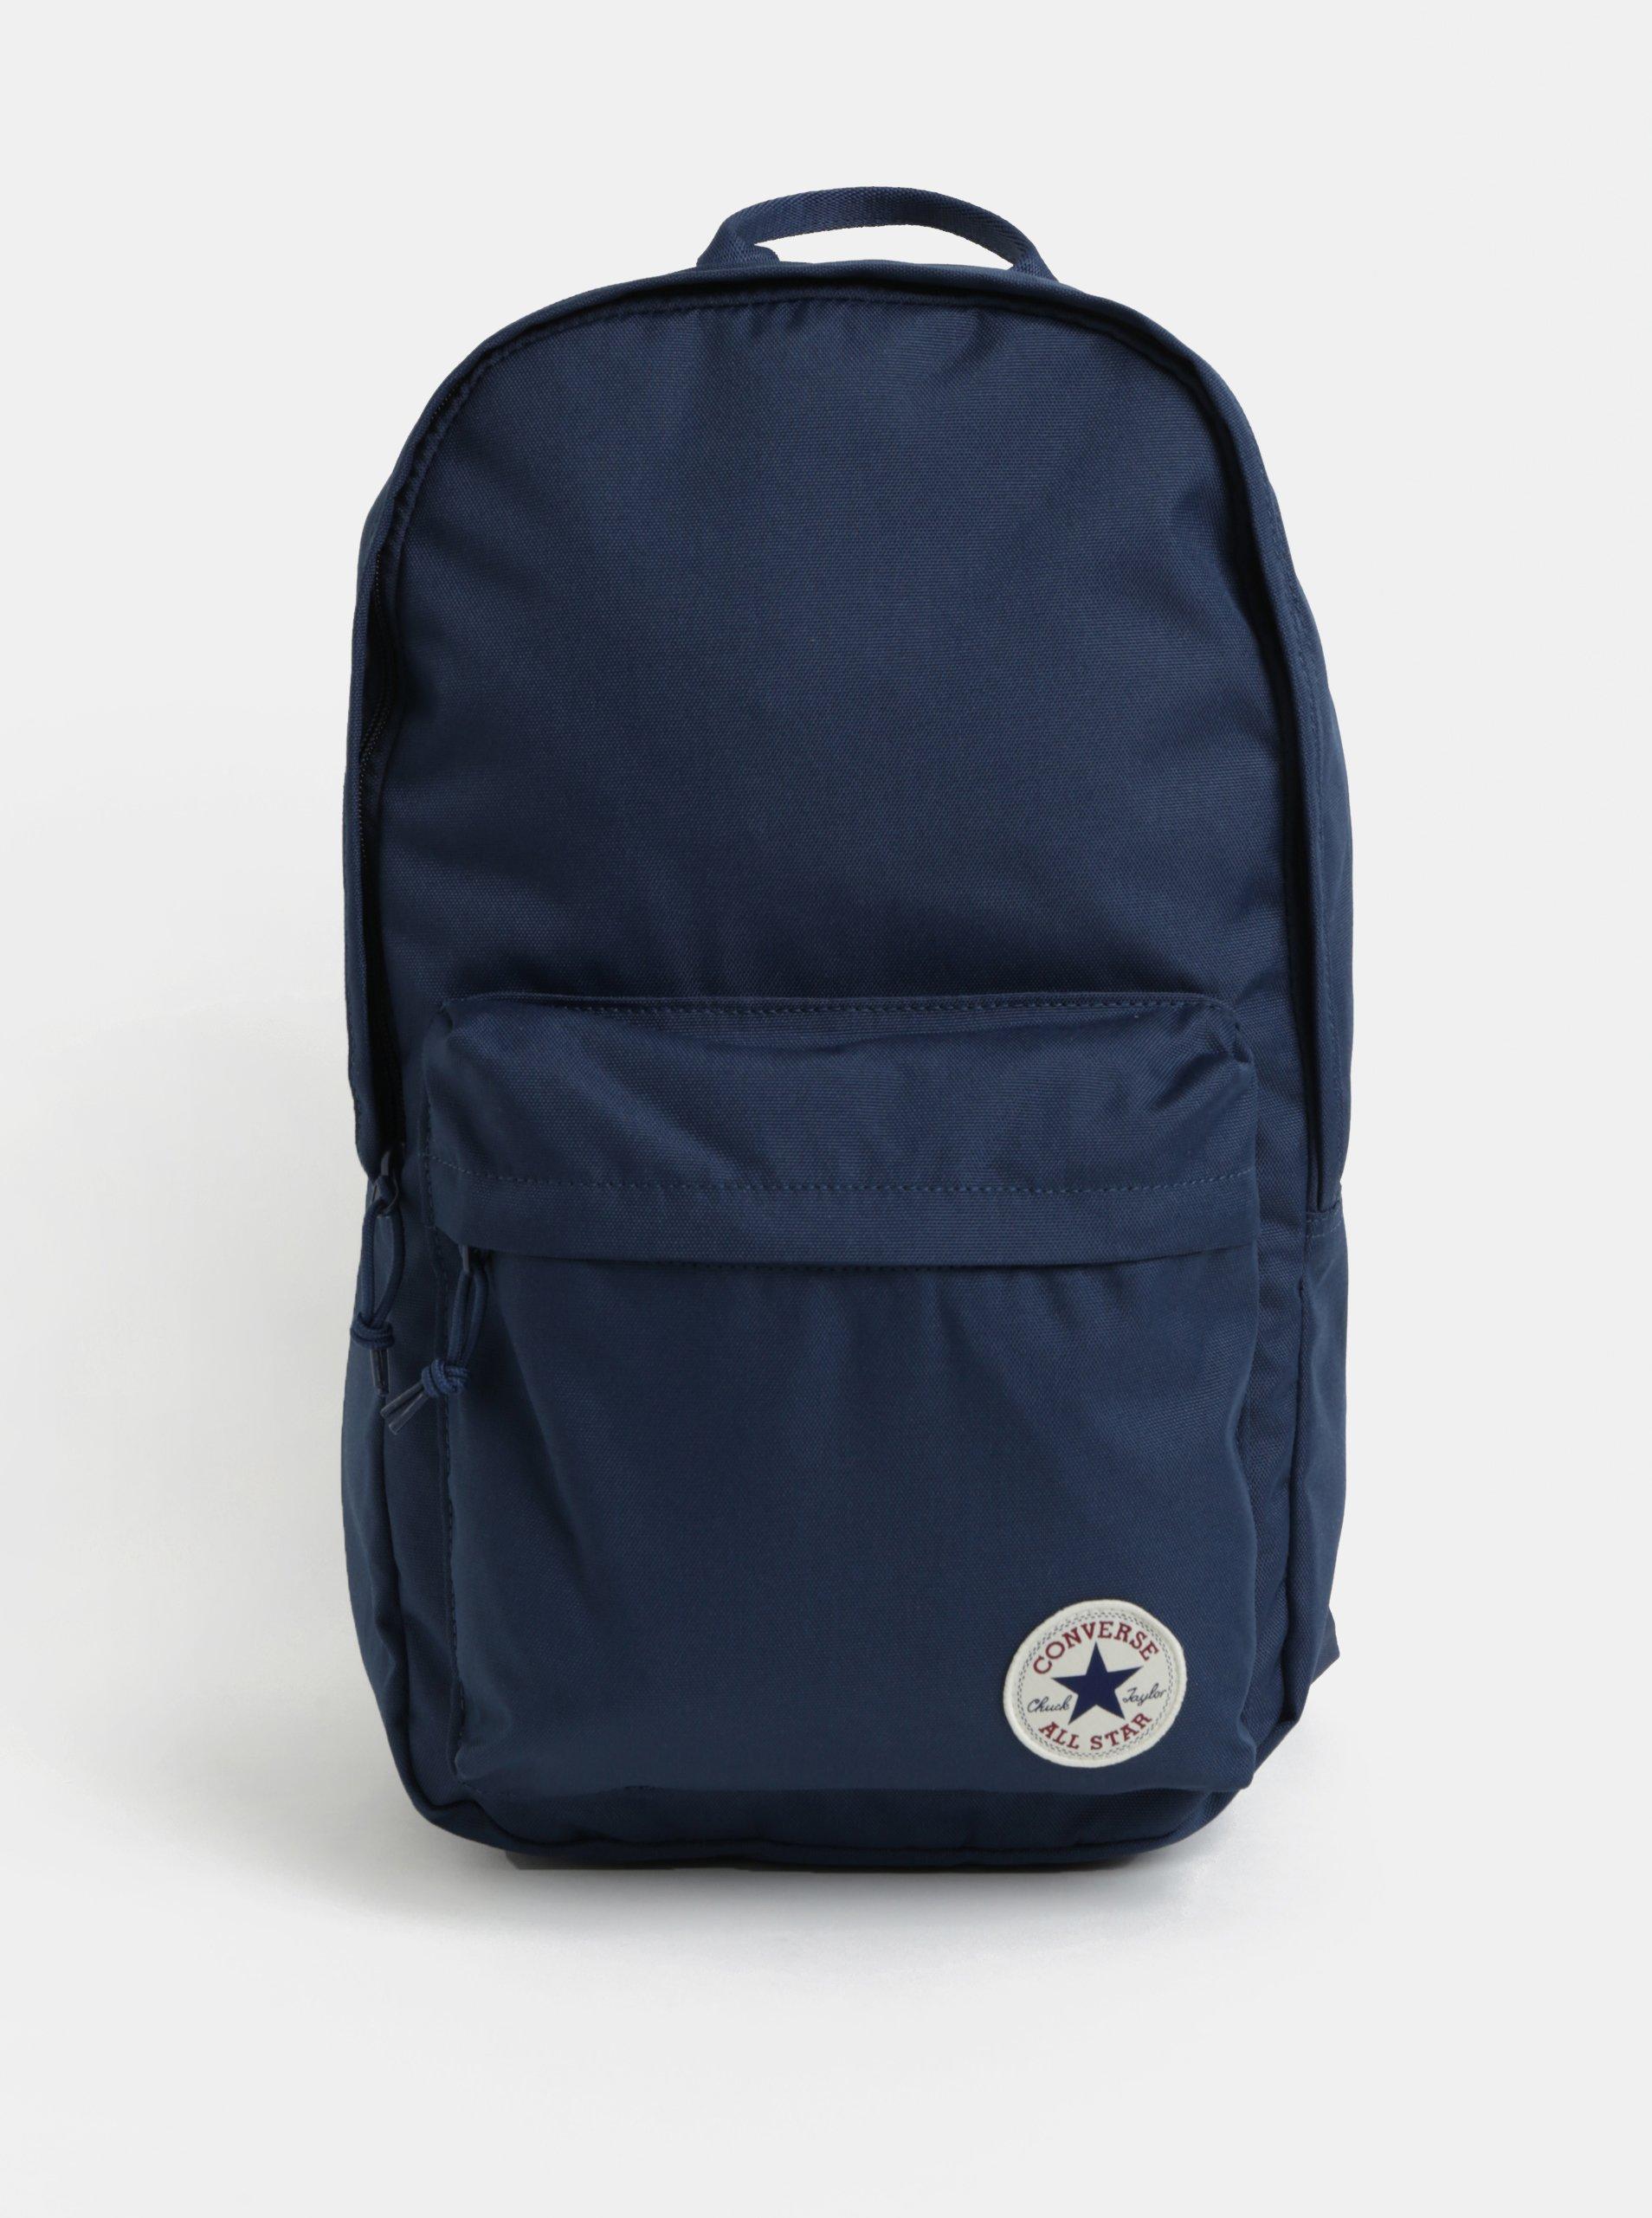 91719934fe1 Tmavě modrý batoh Converse EDC Poly Backpack 19 l